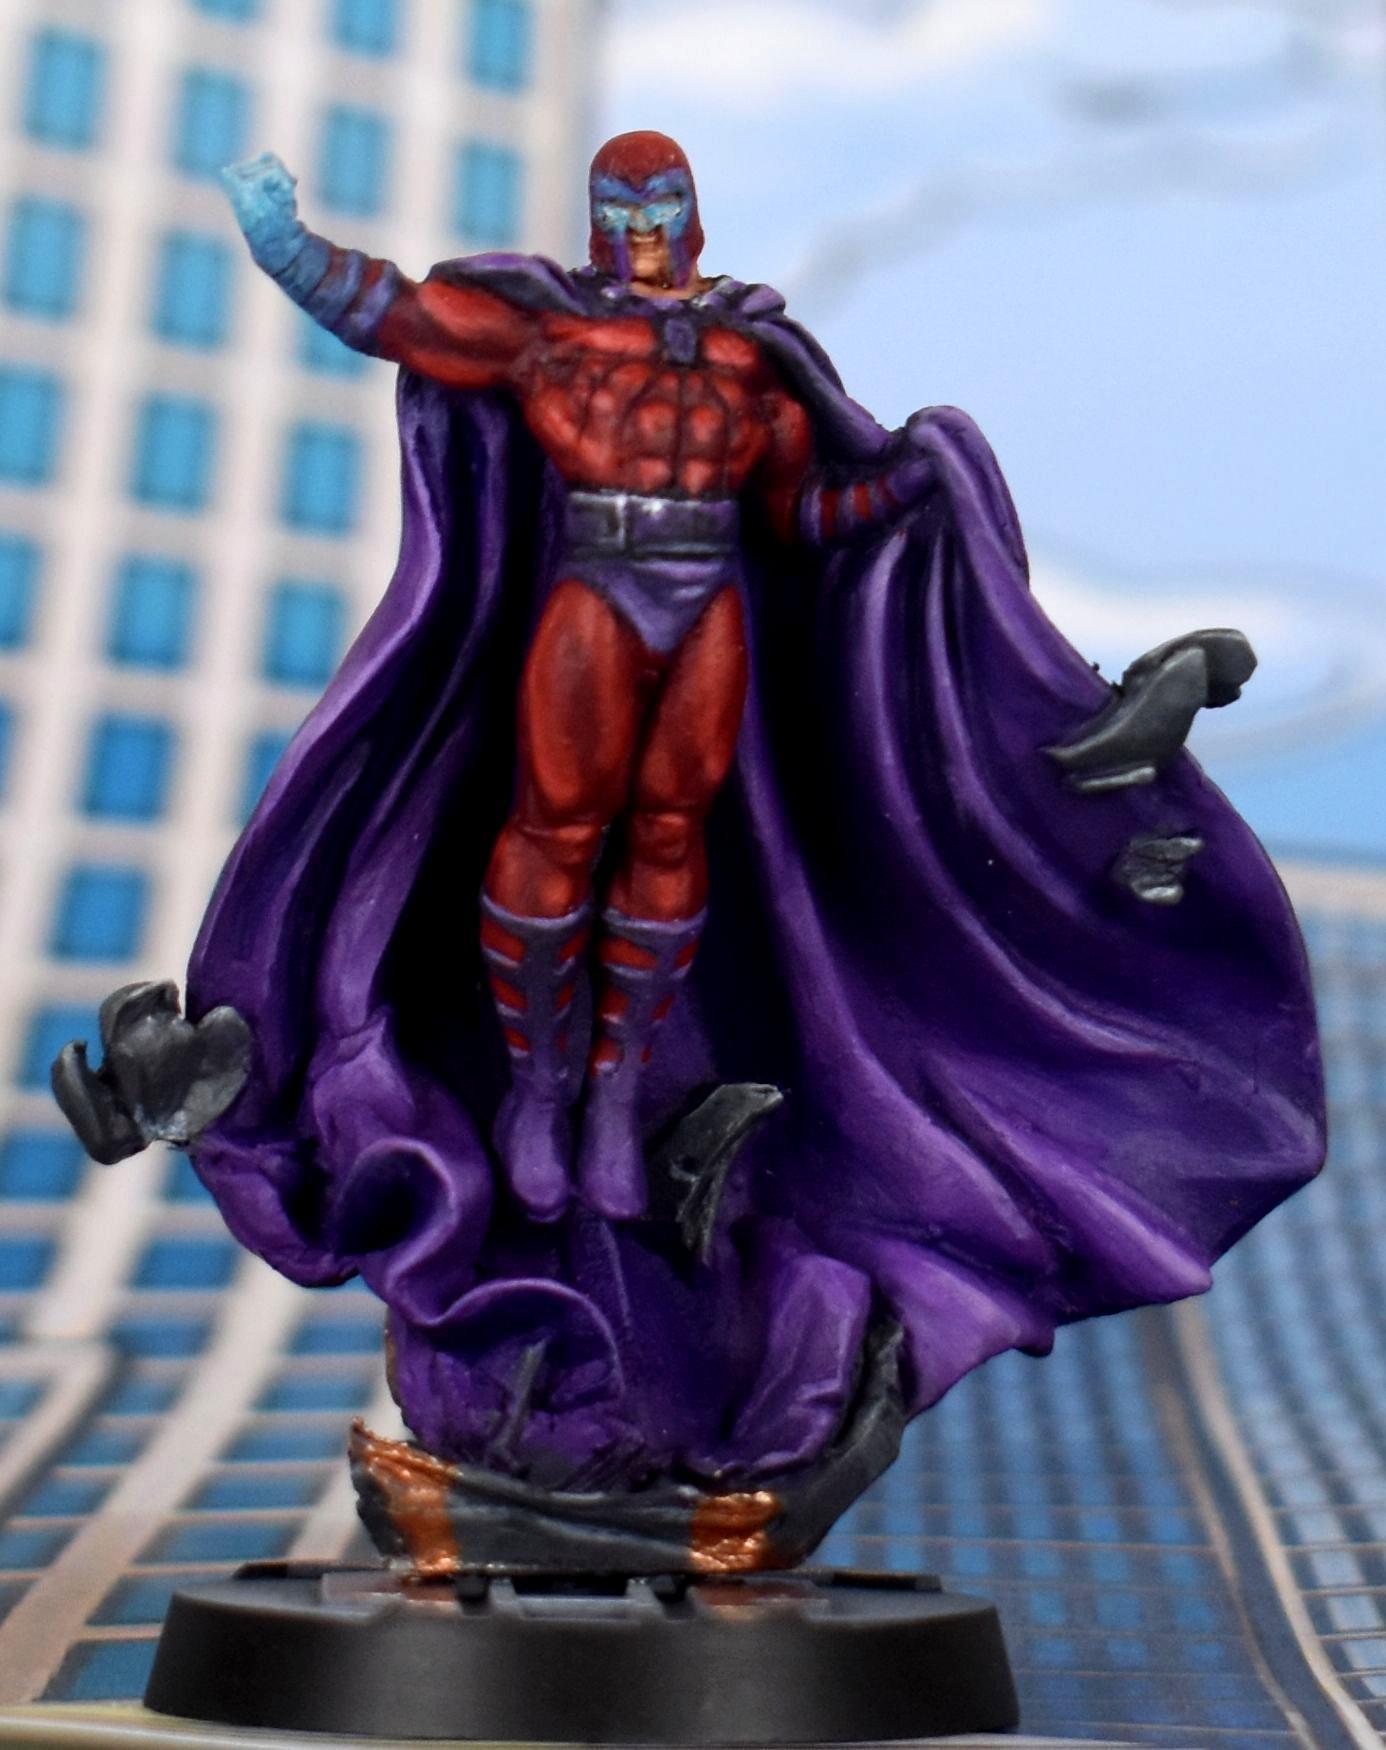 Brotherhood, Comics, Magneto, Marvel, Mystique, Pyro, Superhero, Toad, X-men